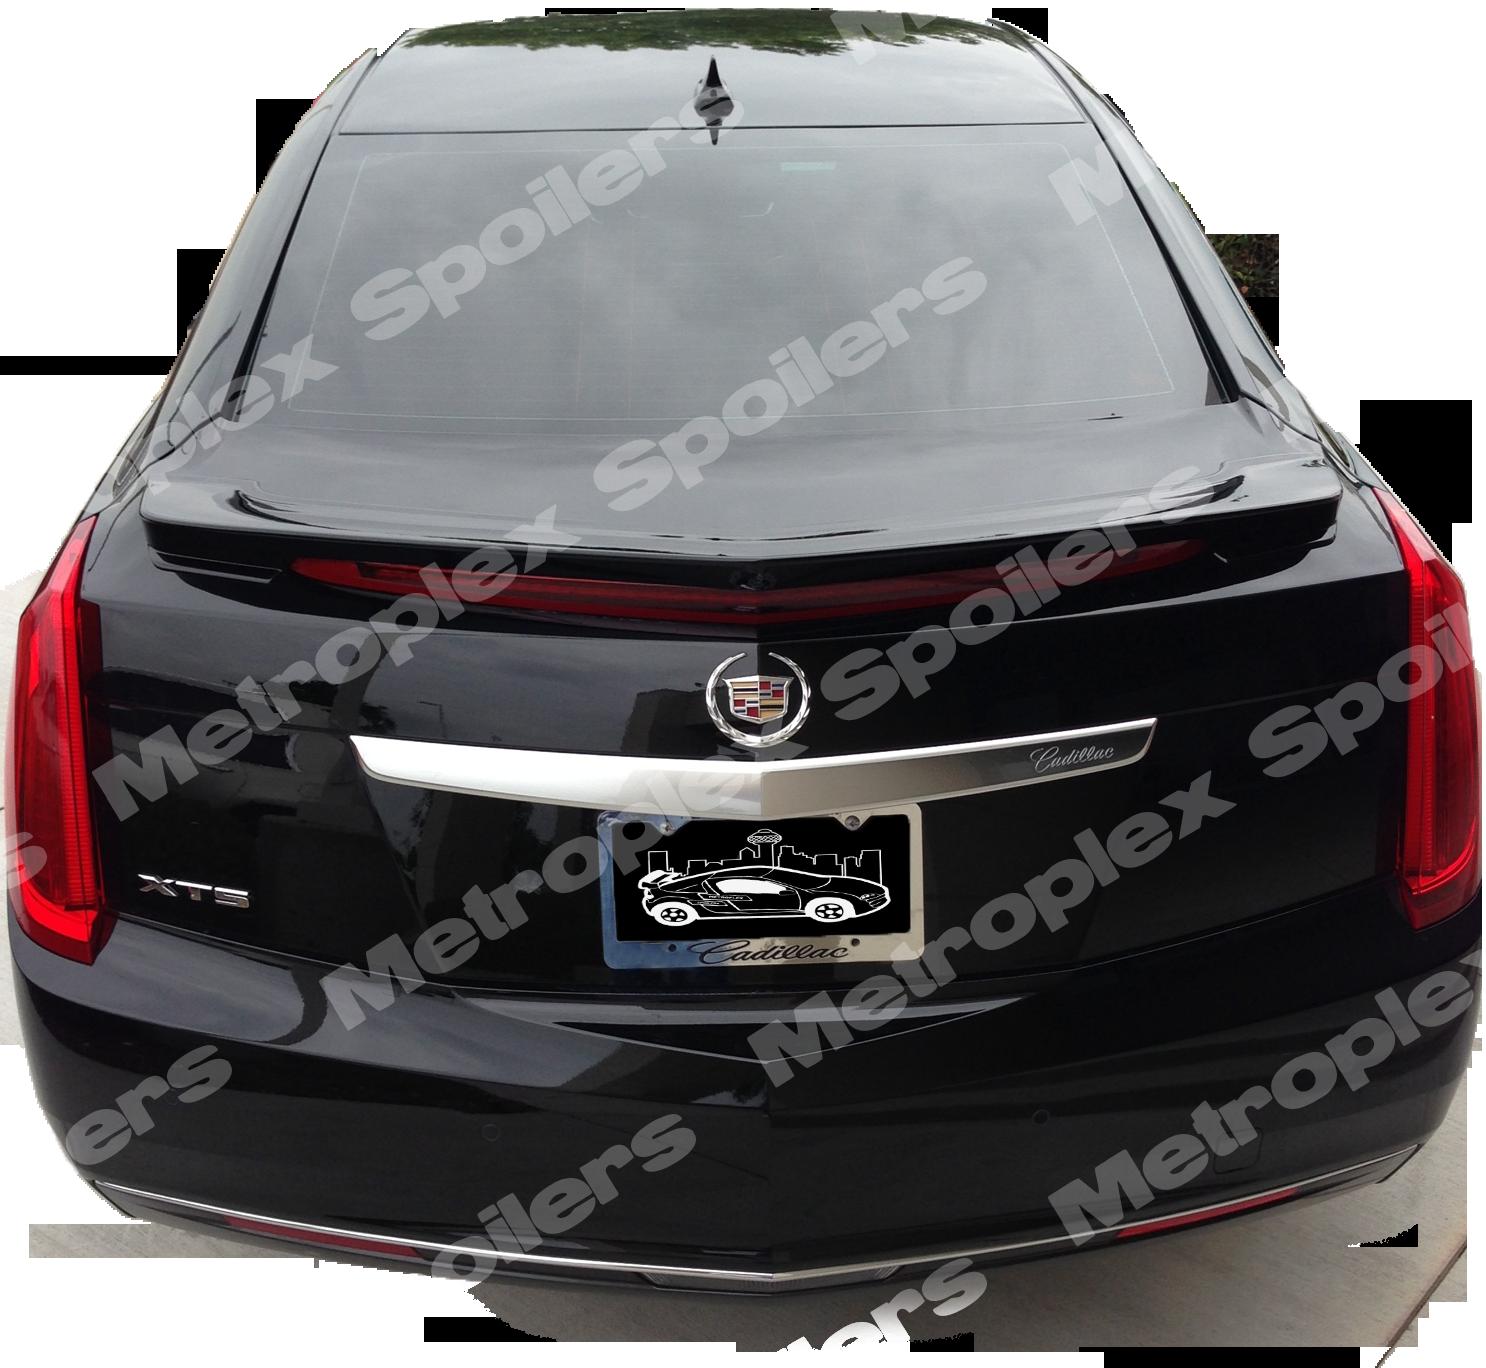 2013+ Cadillac XTS Flush Mount Spoiler